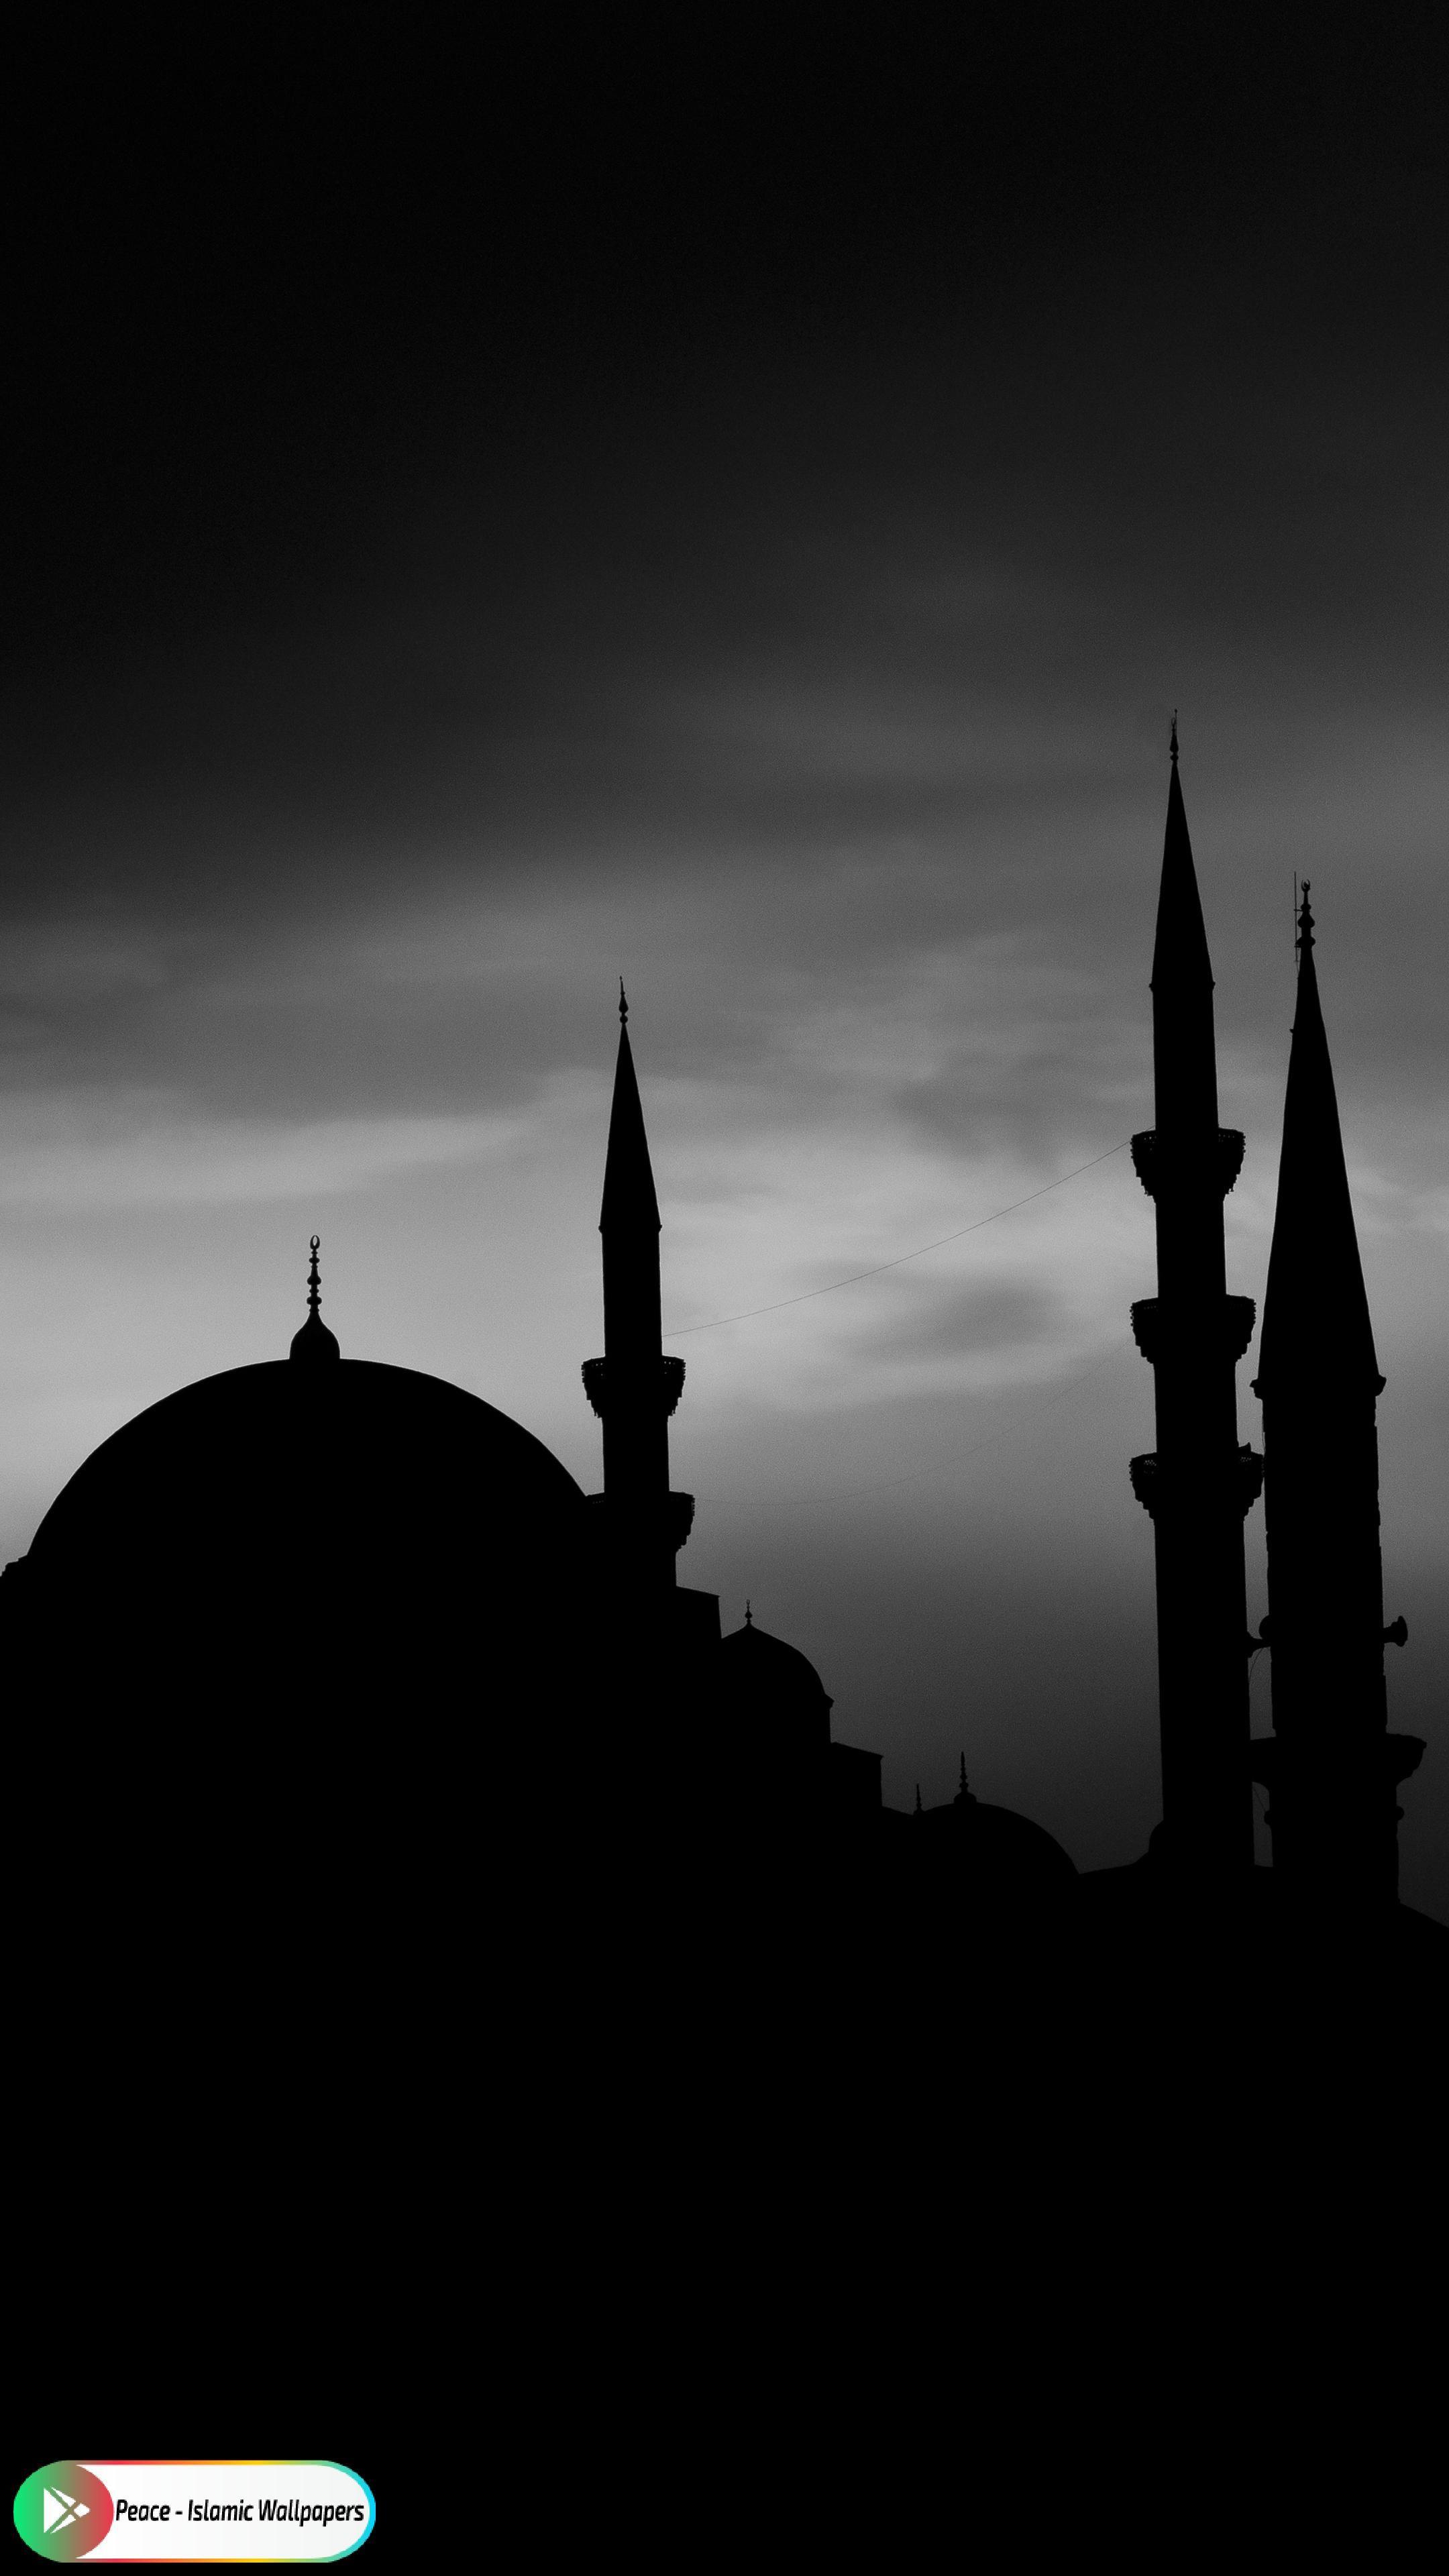 Fajr Islamic Wallpaper Gambar Gelap Fotografi Arsitektur Fotografi Bayangan